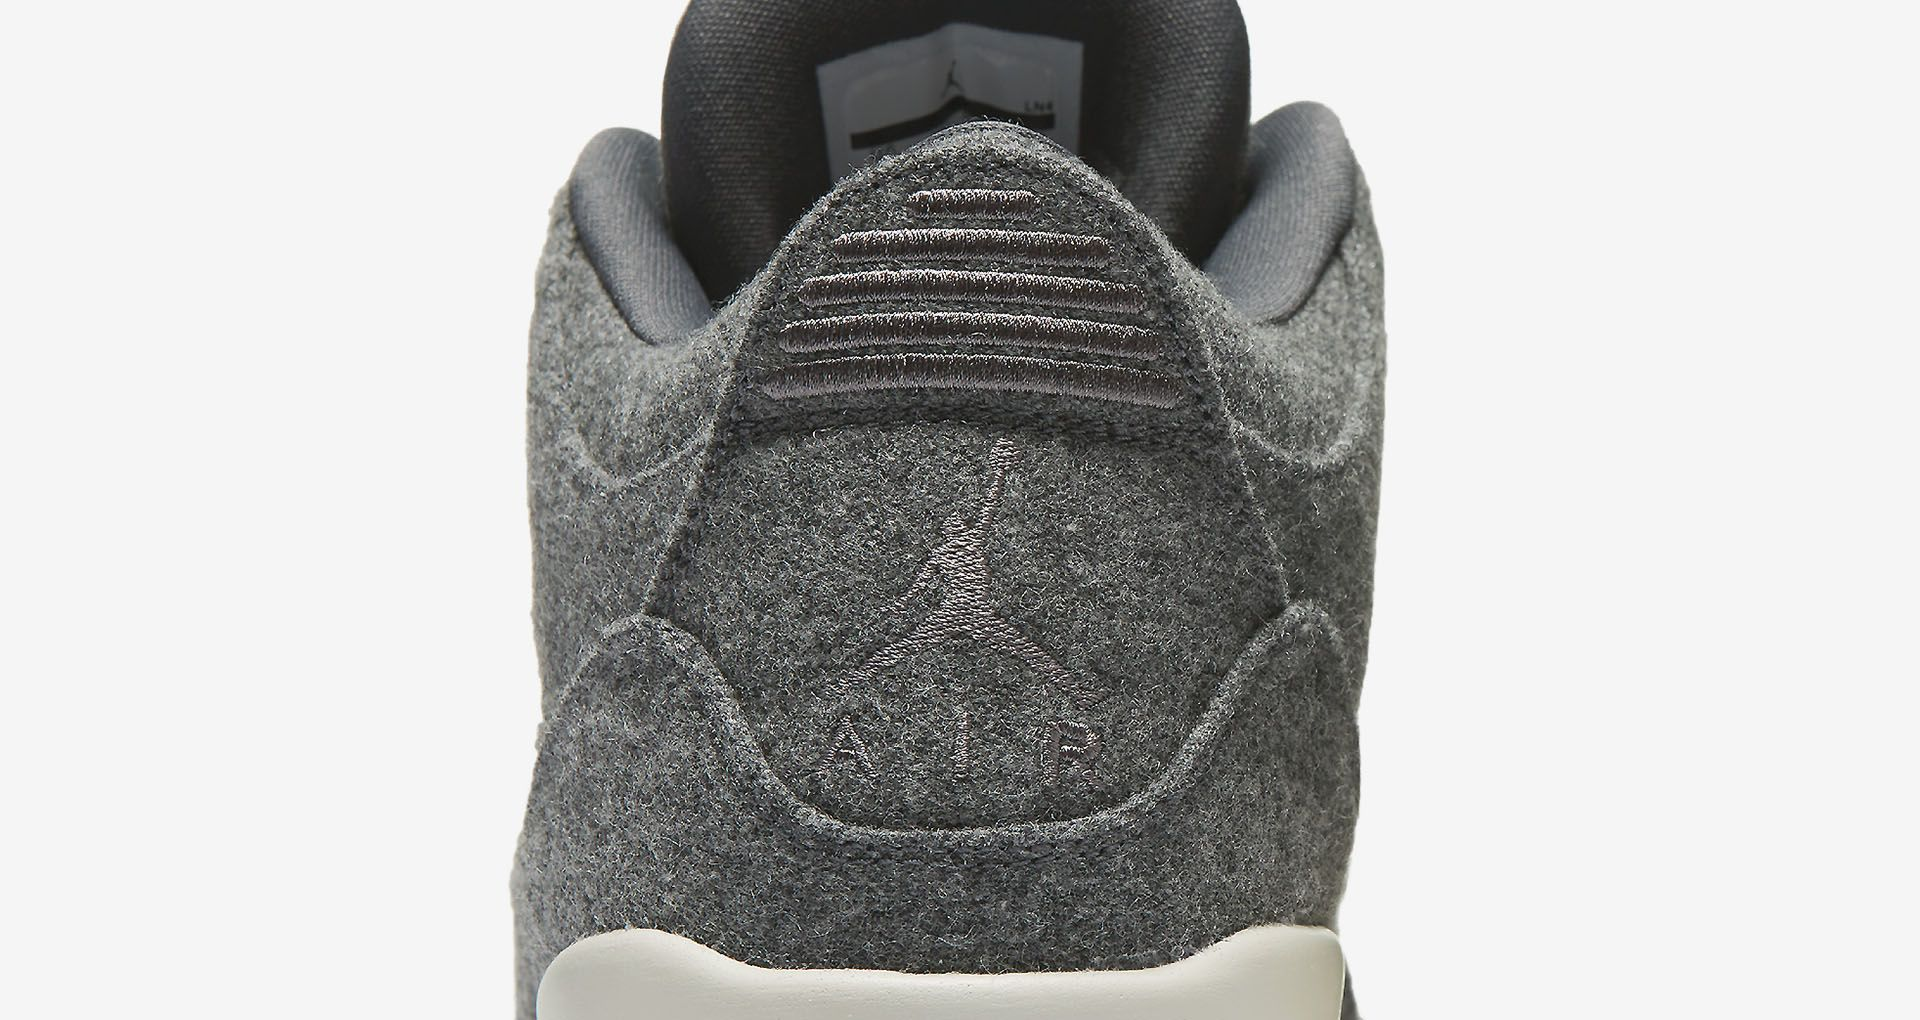 030d9707bc6 Air Jordan 3 Retro 'Dark Grey'. Nike+ SNKRS